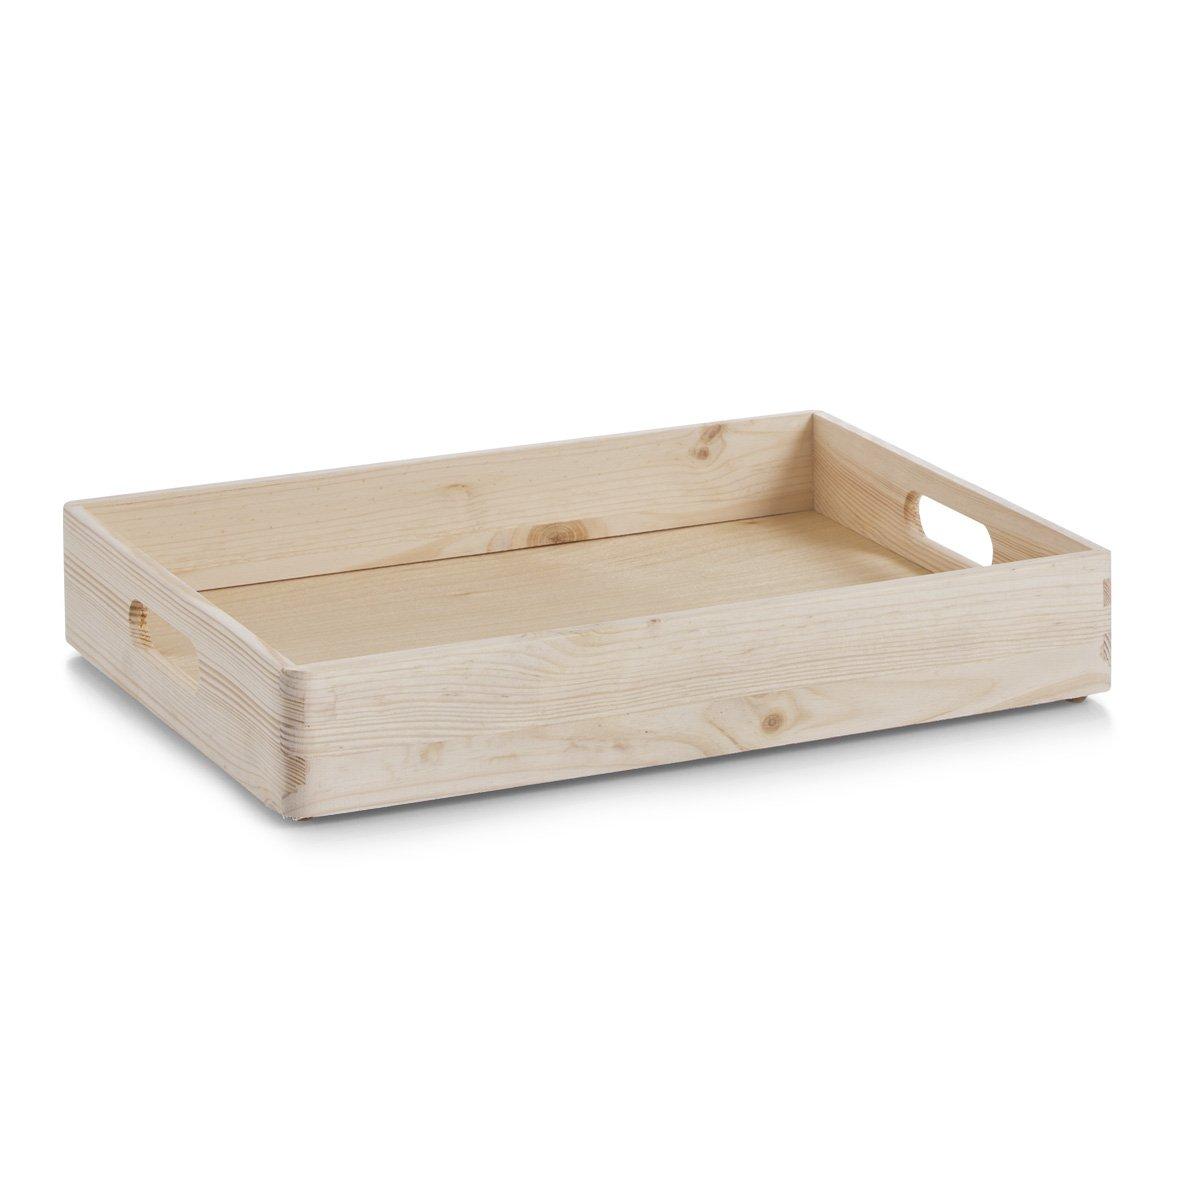 Zeller Multi-Purpose Box, Pinewood, Multi-Colour, 40 x 30 x 7 cm 13142